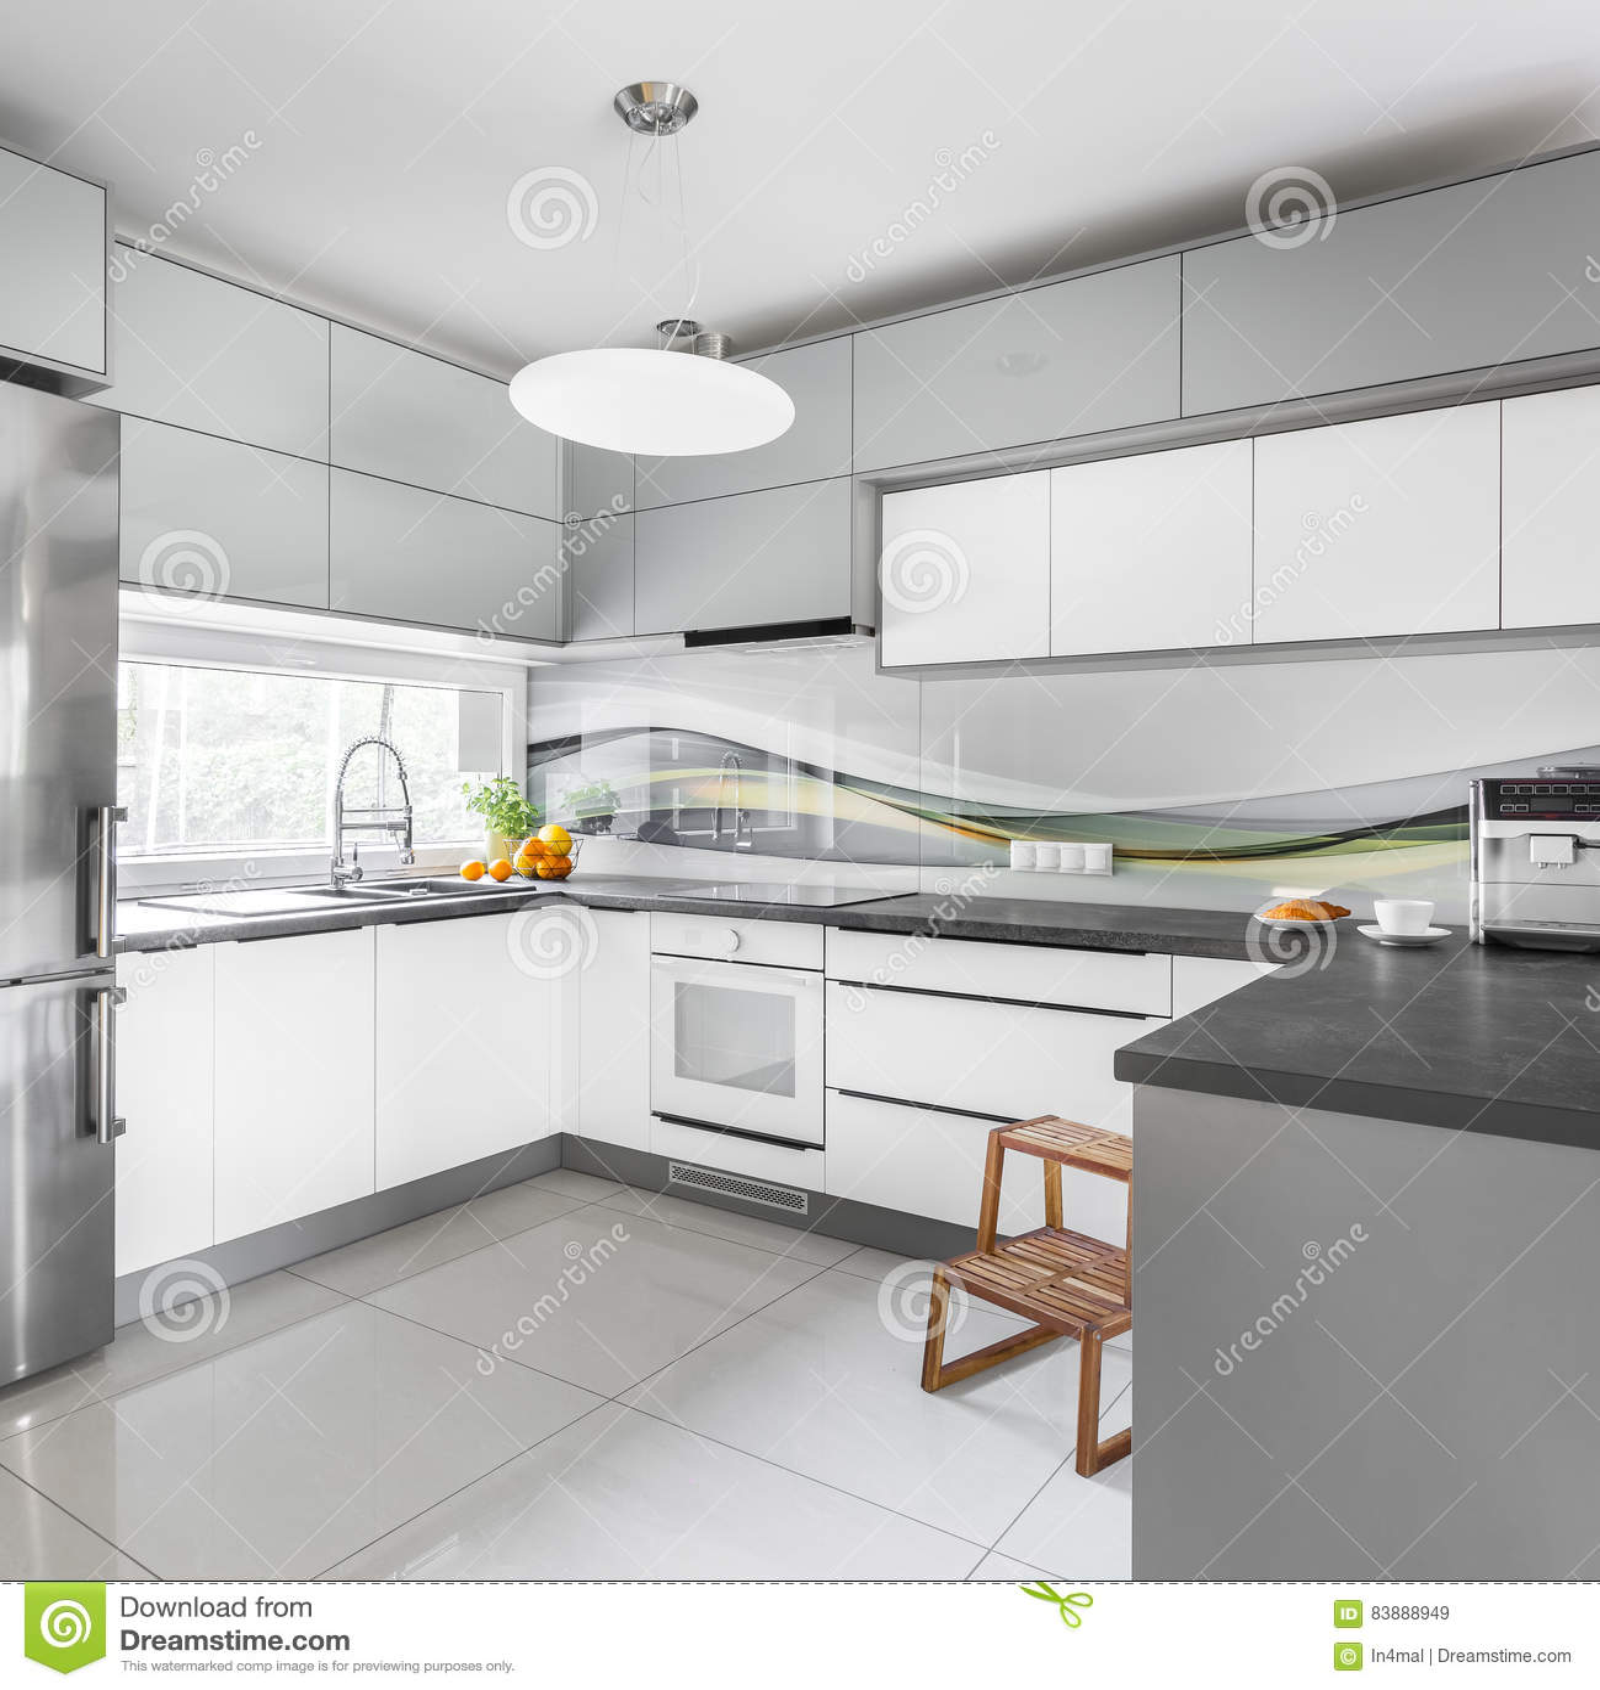 https://thumbs.dreamstime.com/z/cucina-grigia-e-bianca-83888949.jpg